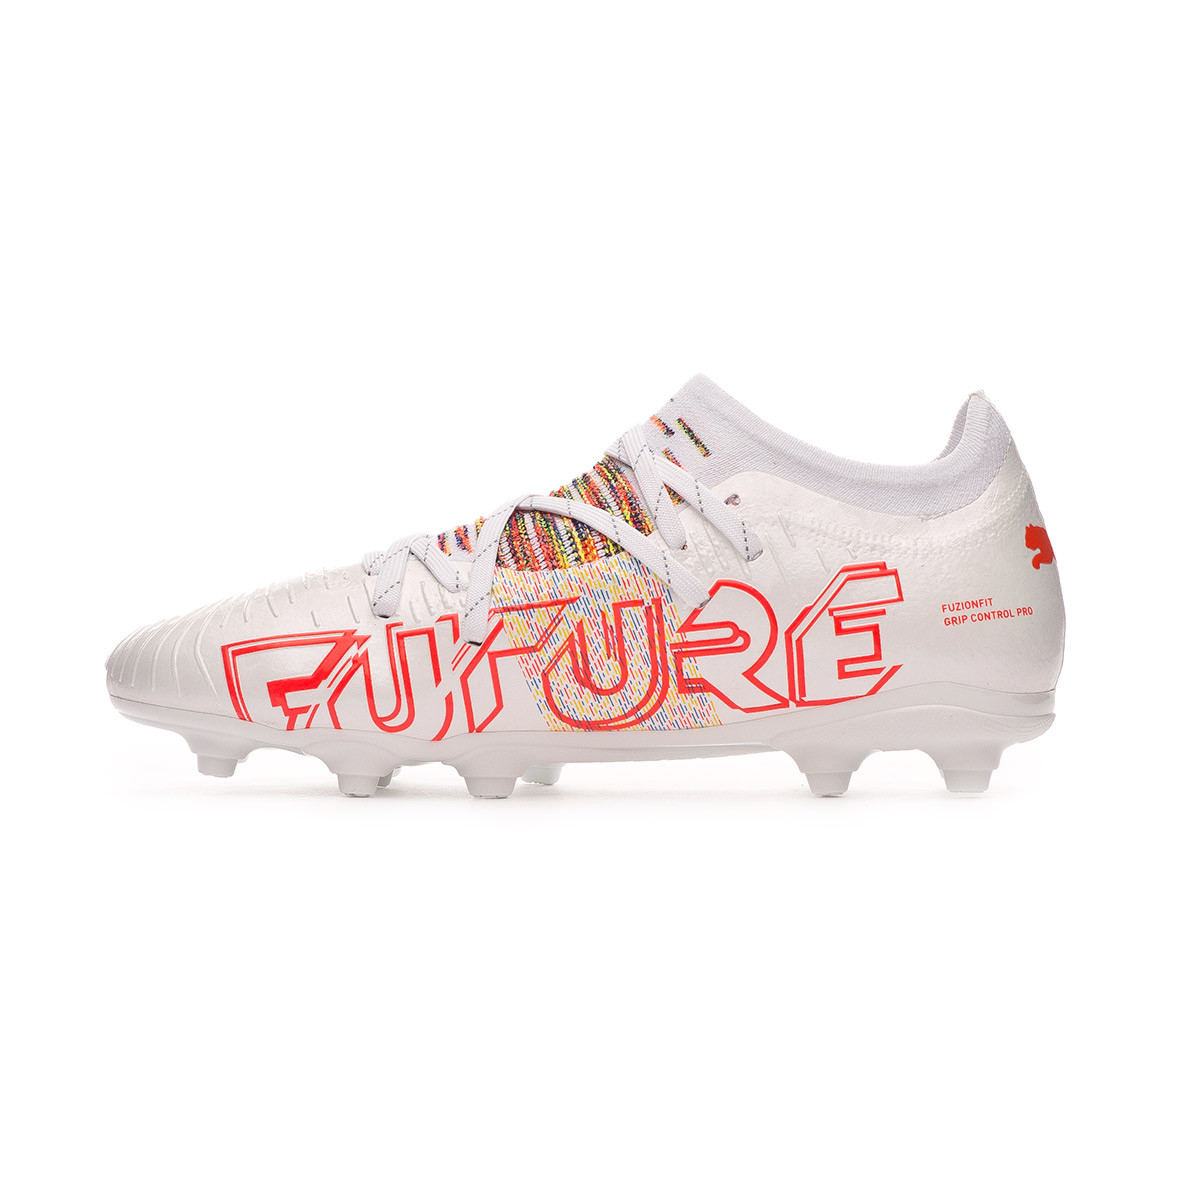 Puma Kids Future Z 2.1 FG/AG Football Boots